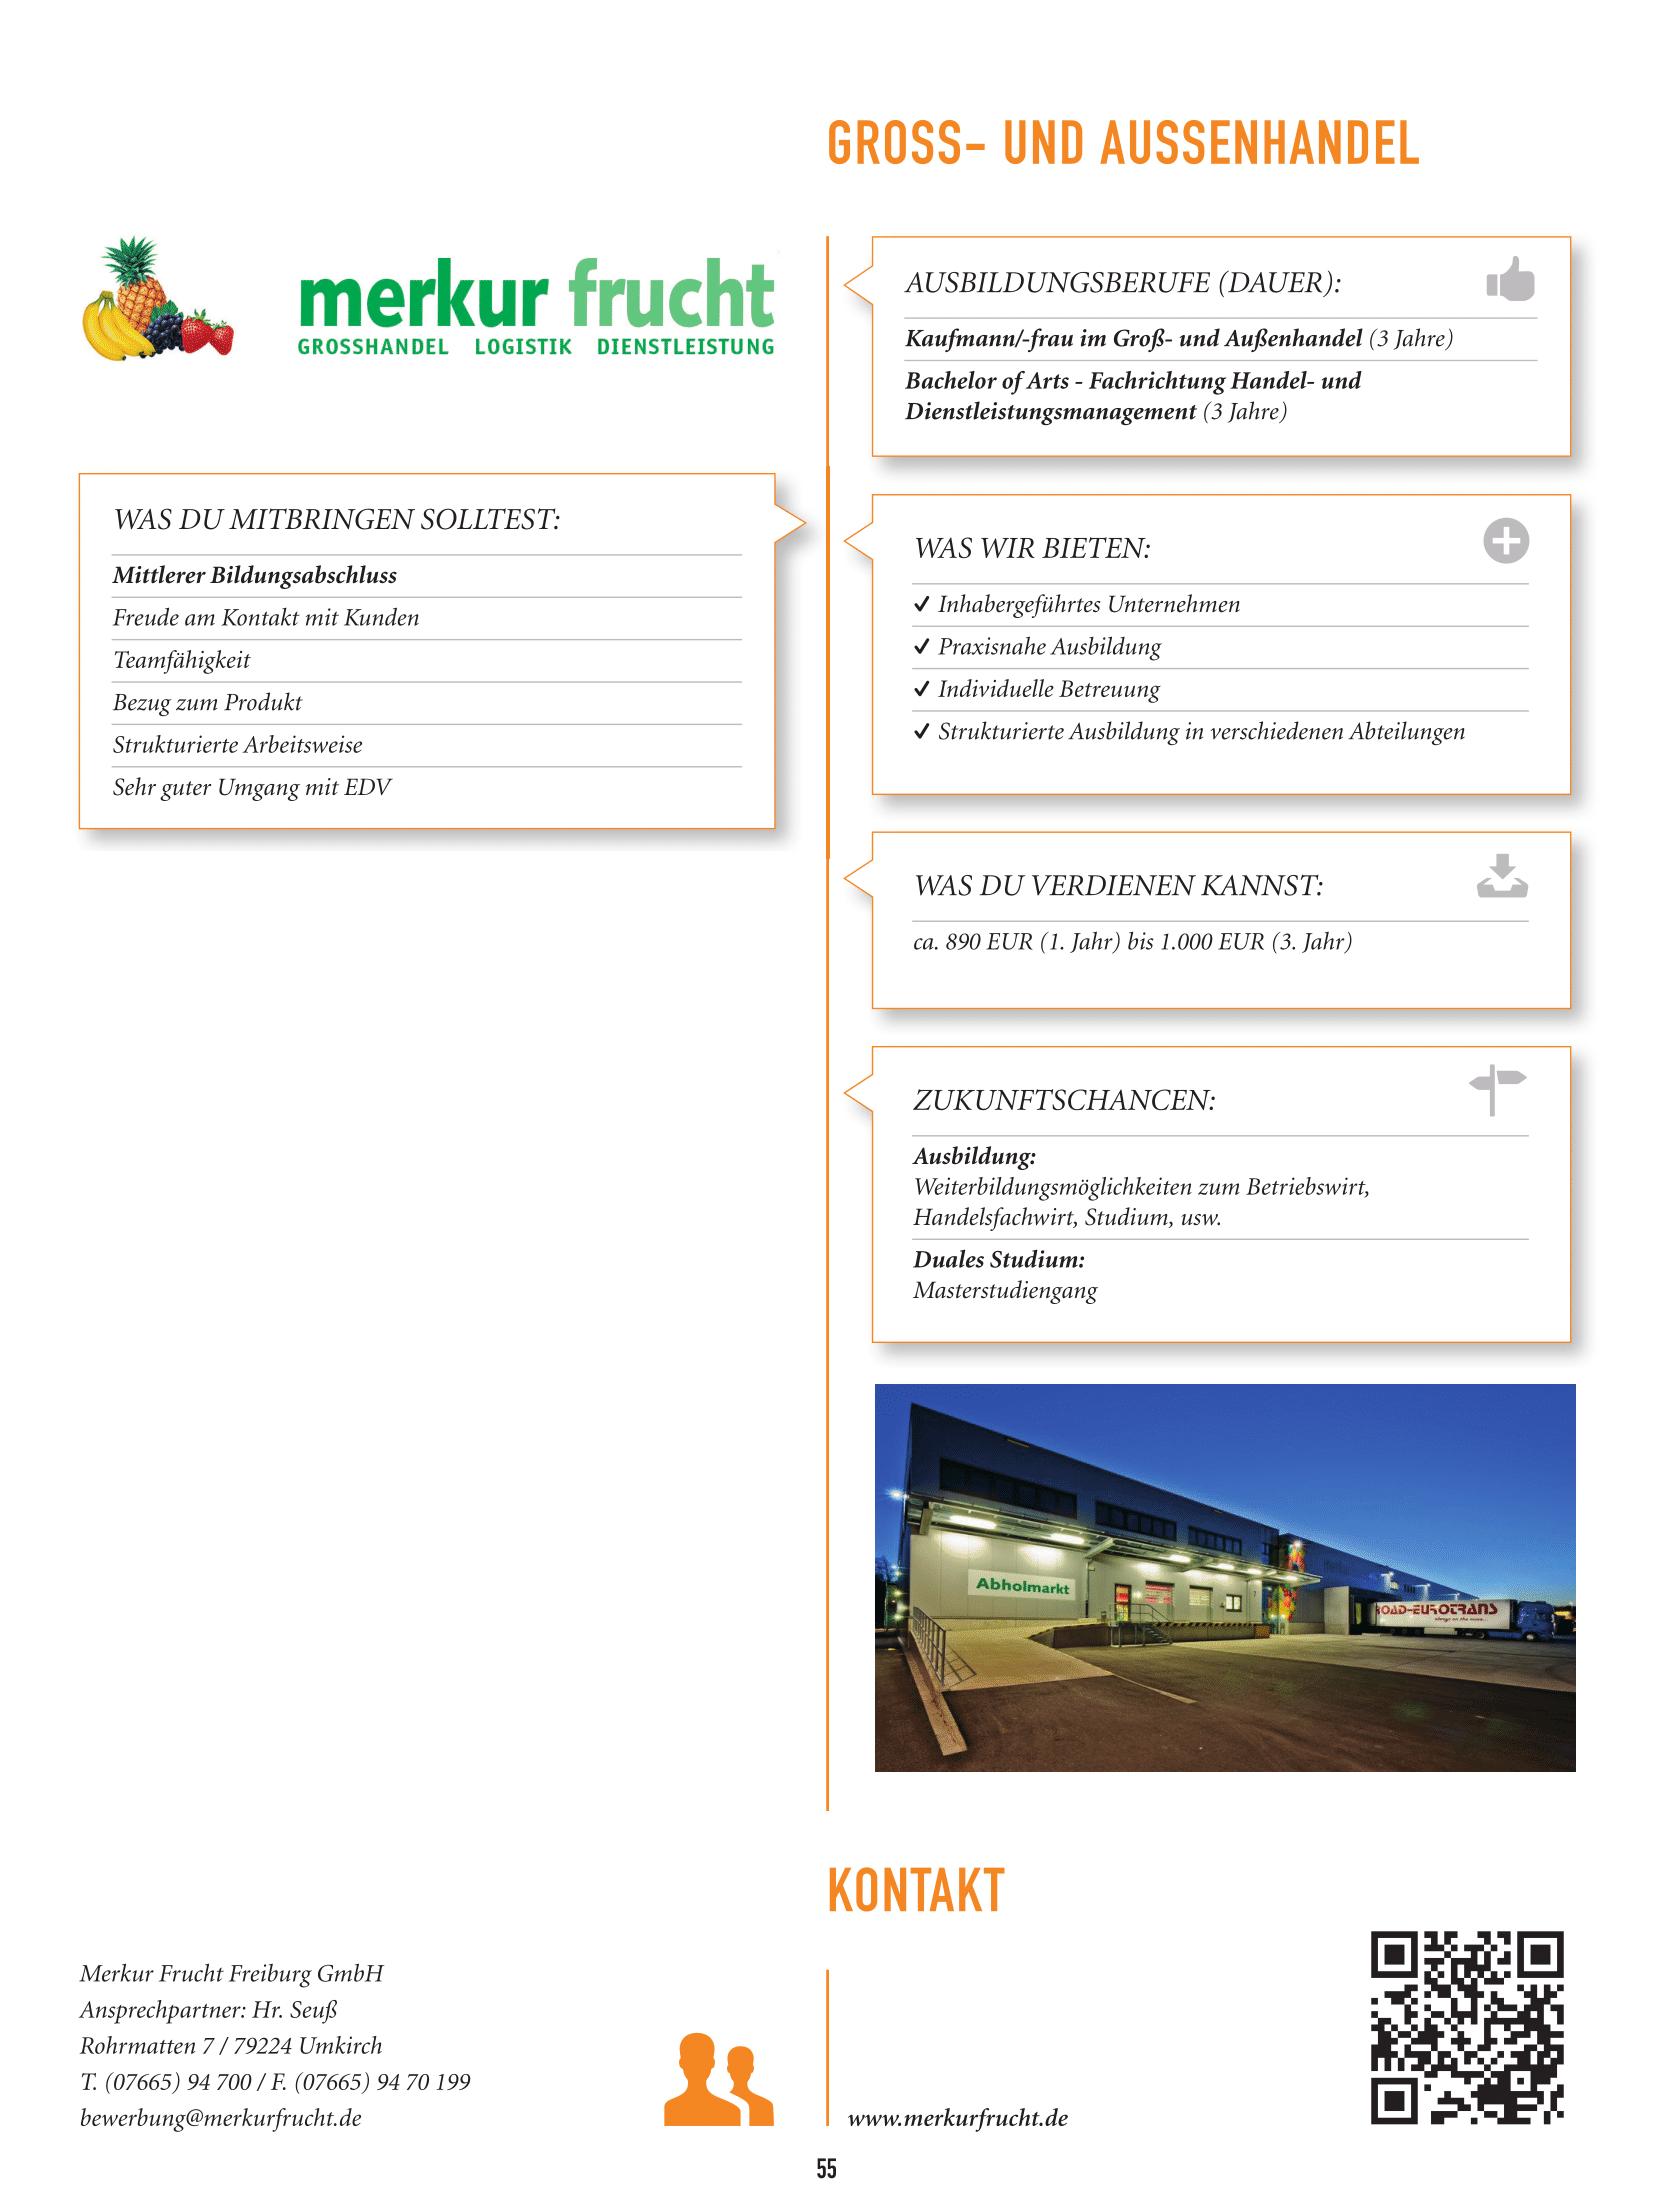 AHB_2016_Korrekturabzug_merkur_frucht_2-2